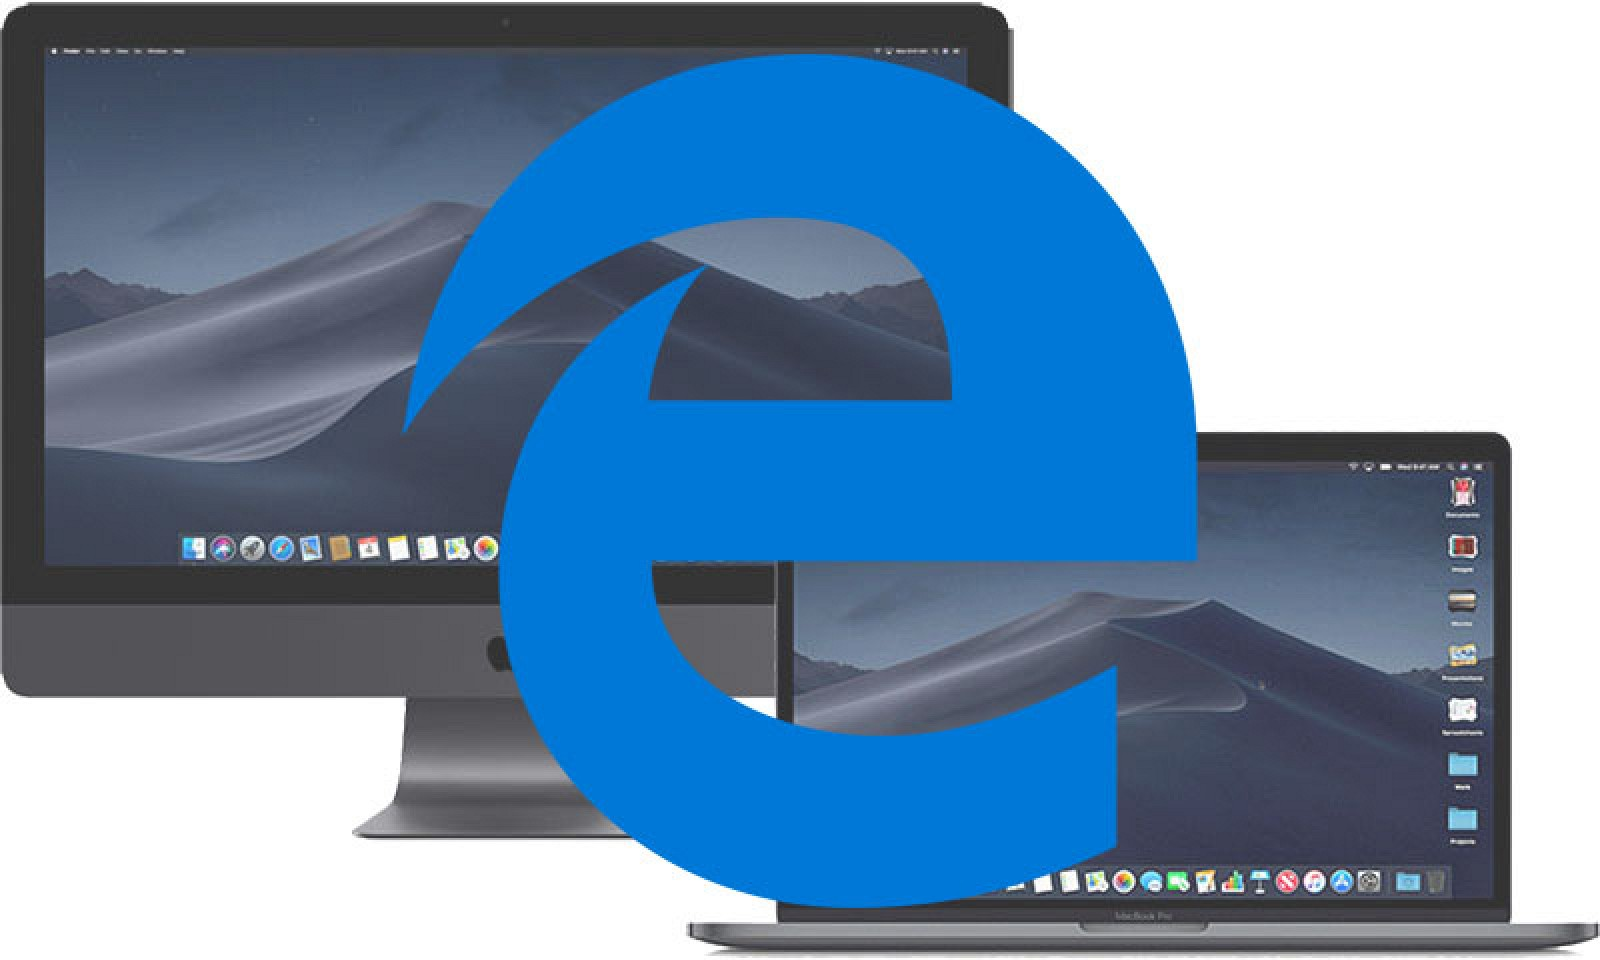 download windows explorer 11 for mac